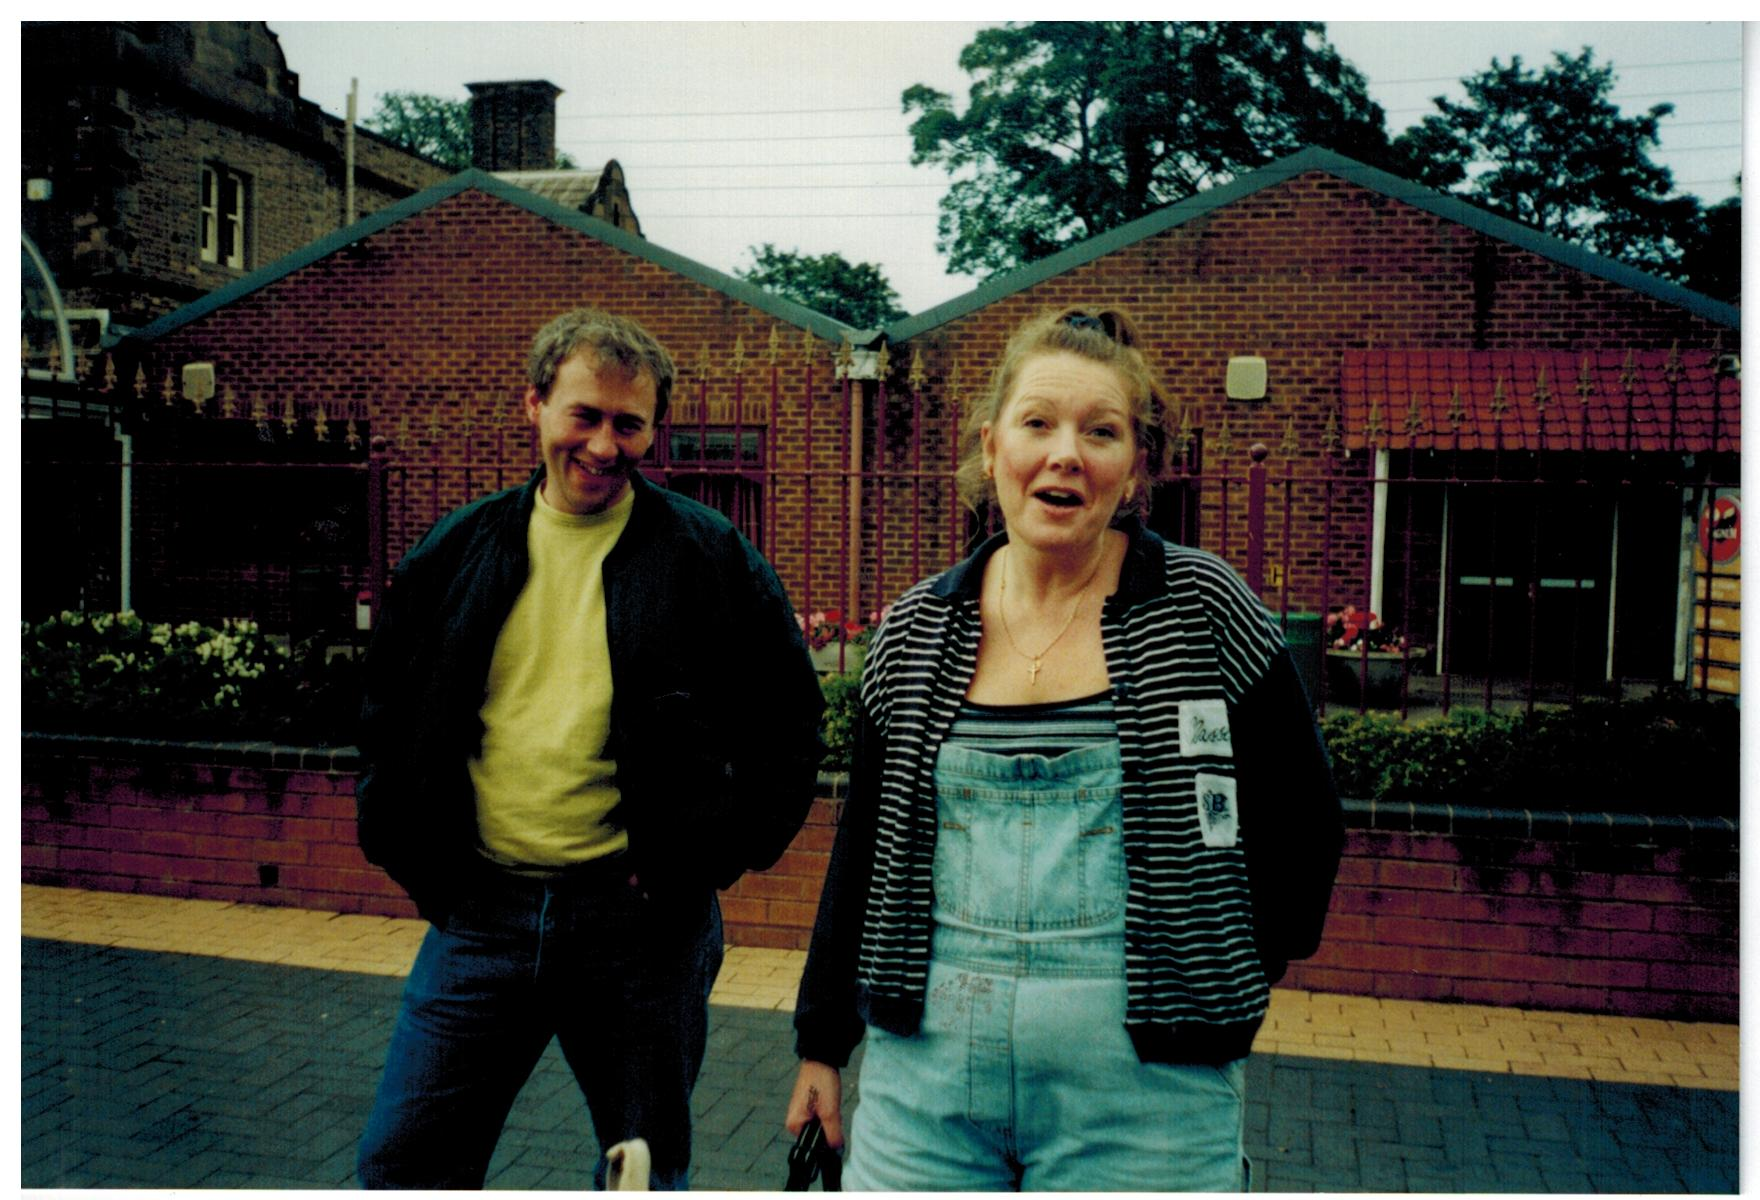 H165_Drayton-Manor-2000